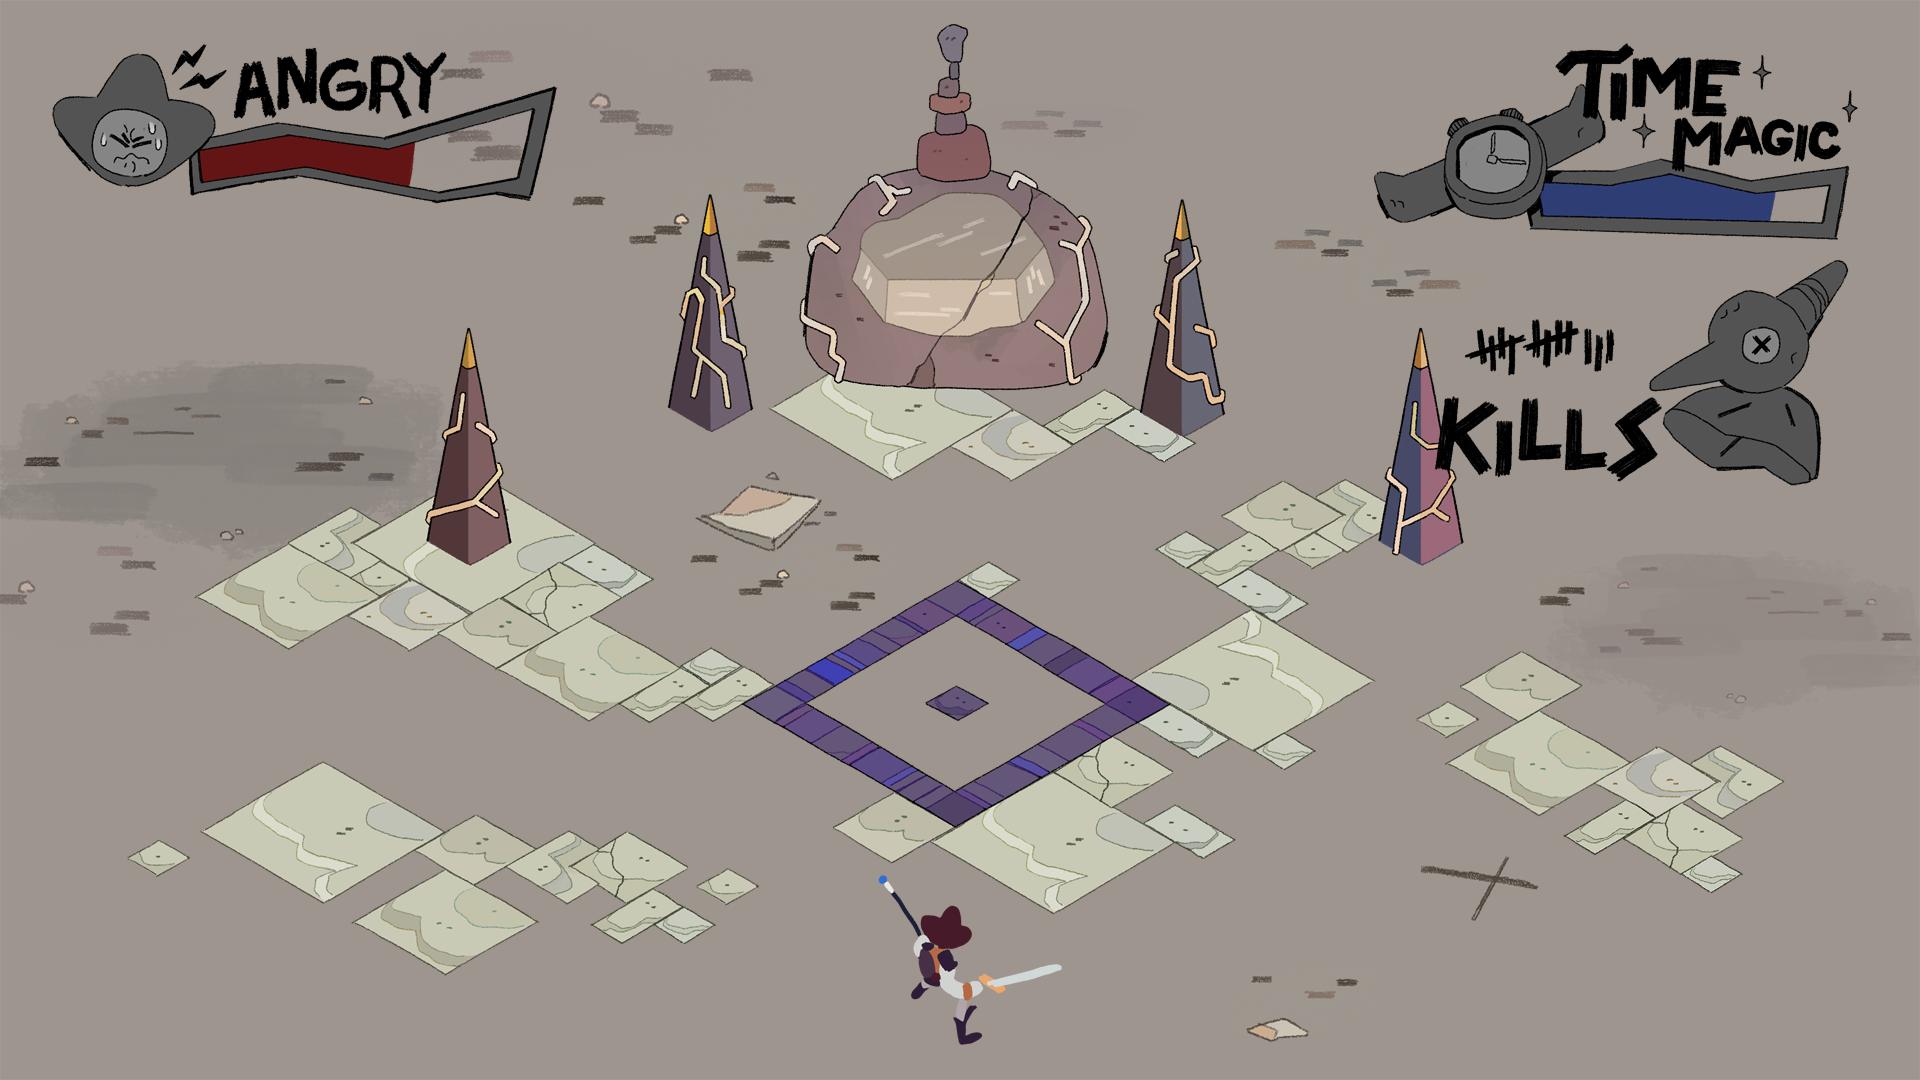 Mockup of the Final Arena including UI assets.